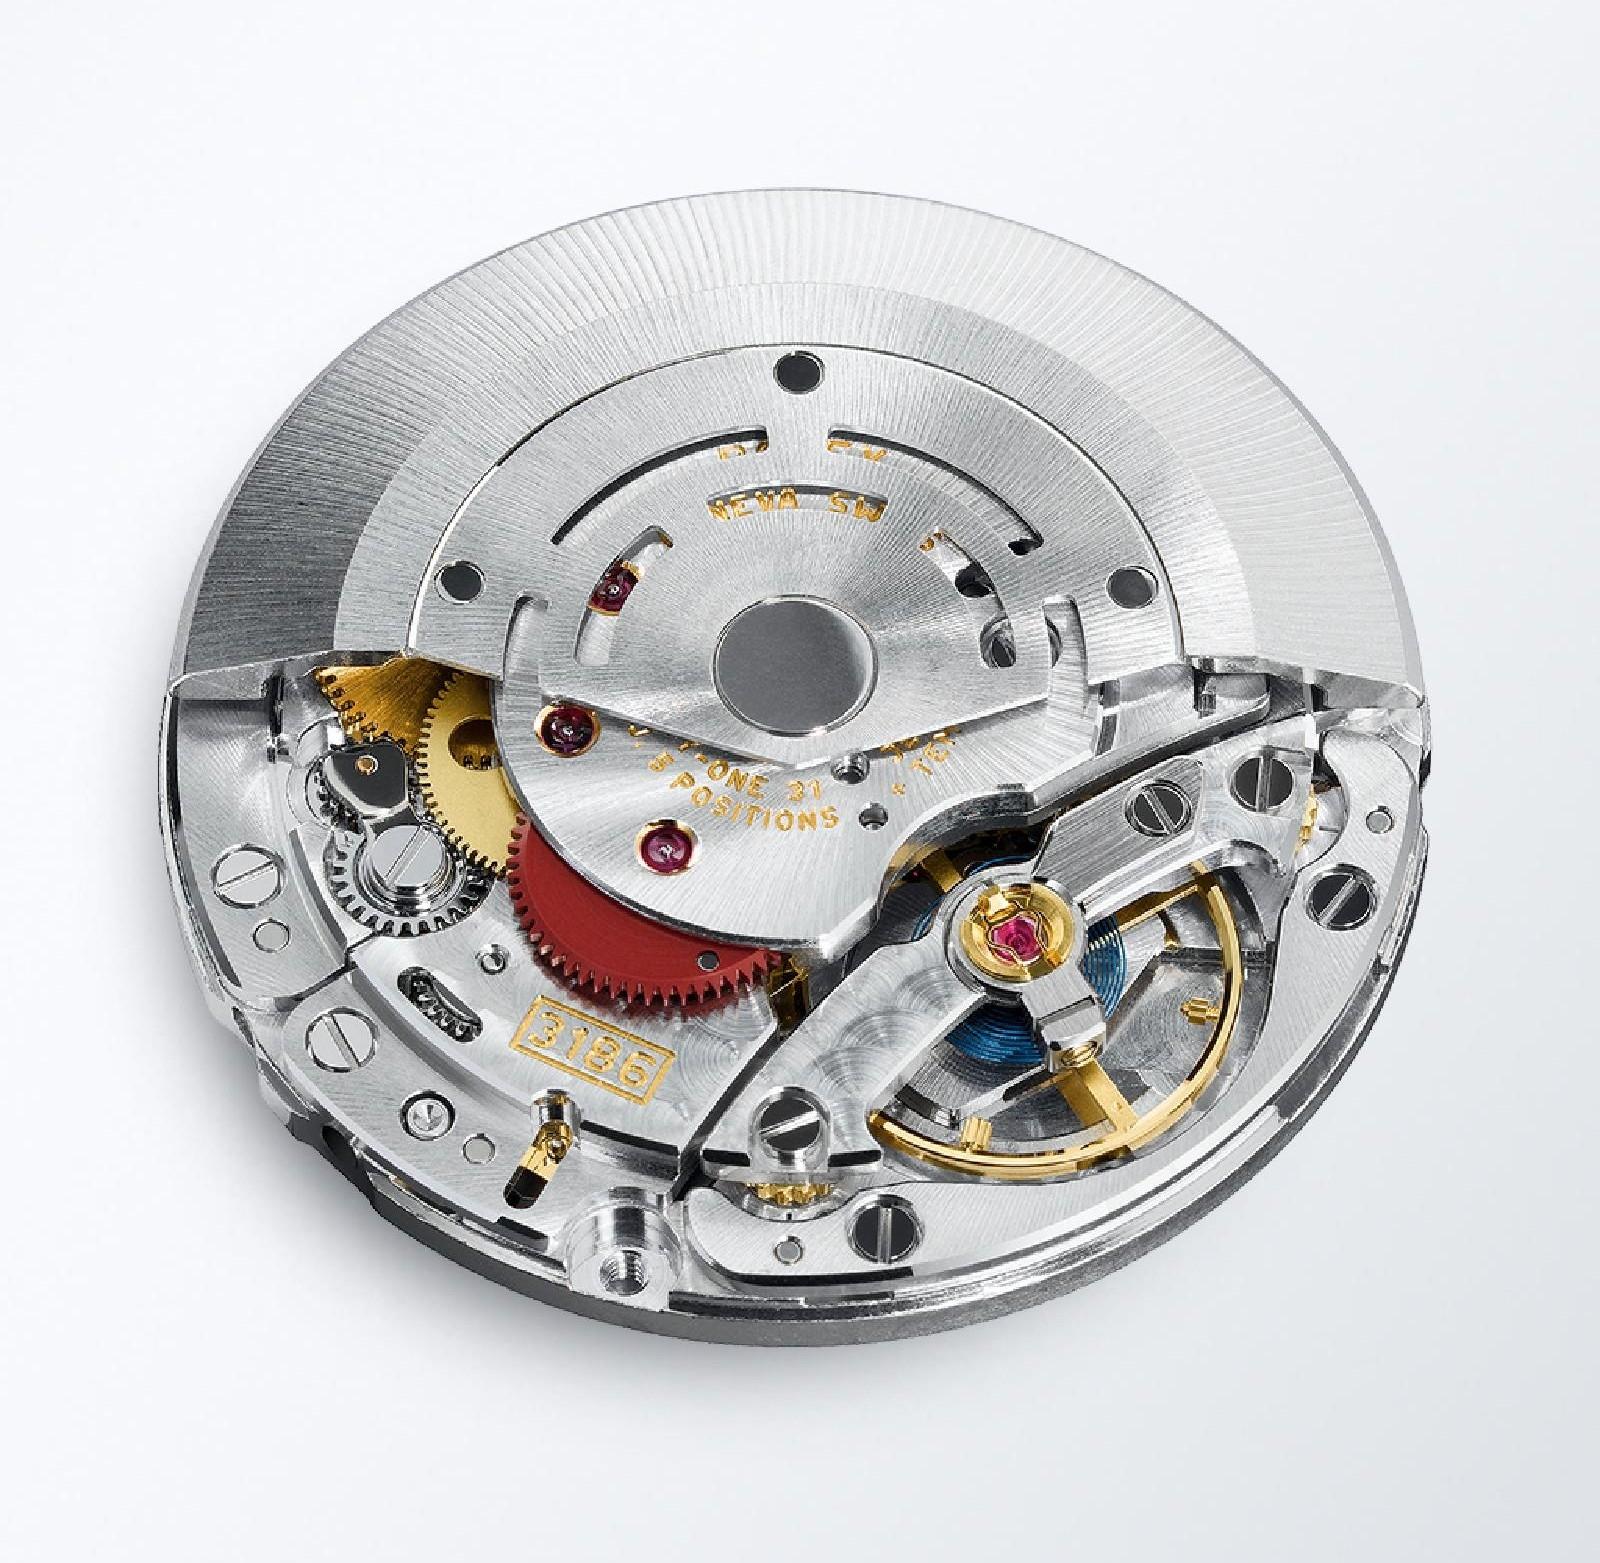 Watch Movement - Automatic - Rolex 3186